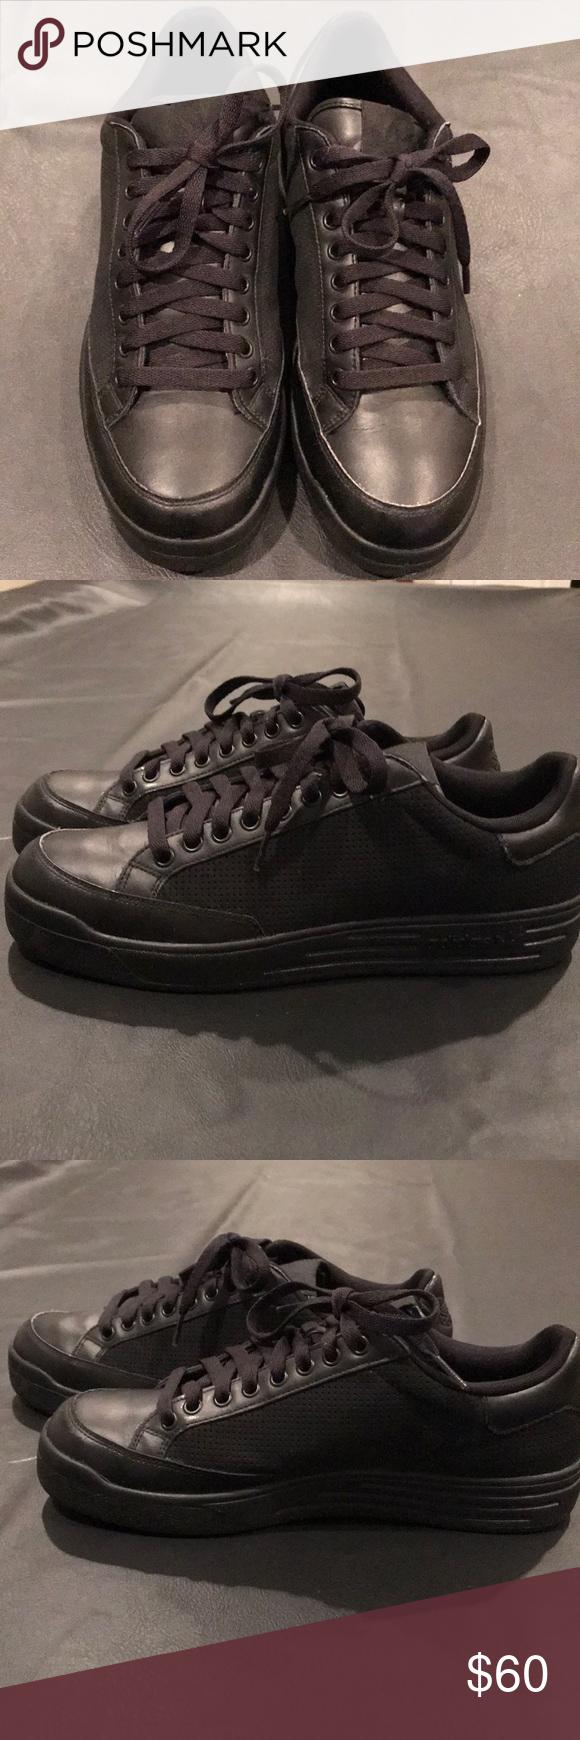 black rod alghe scarpe adidas nero adidas, adidas e le adidas